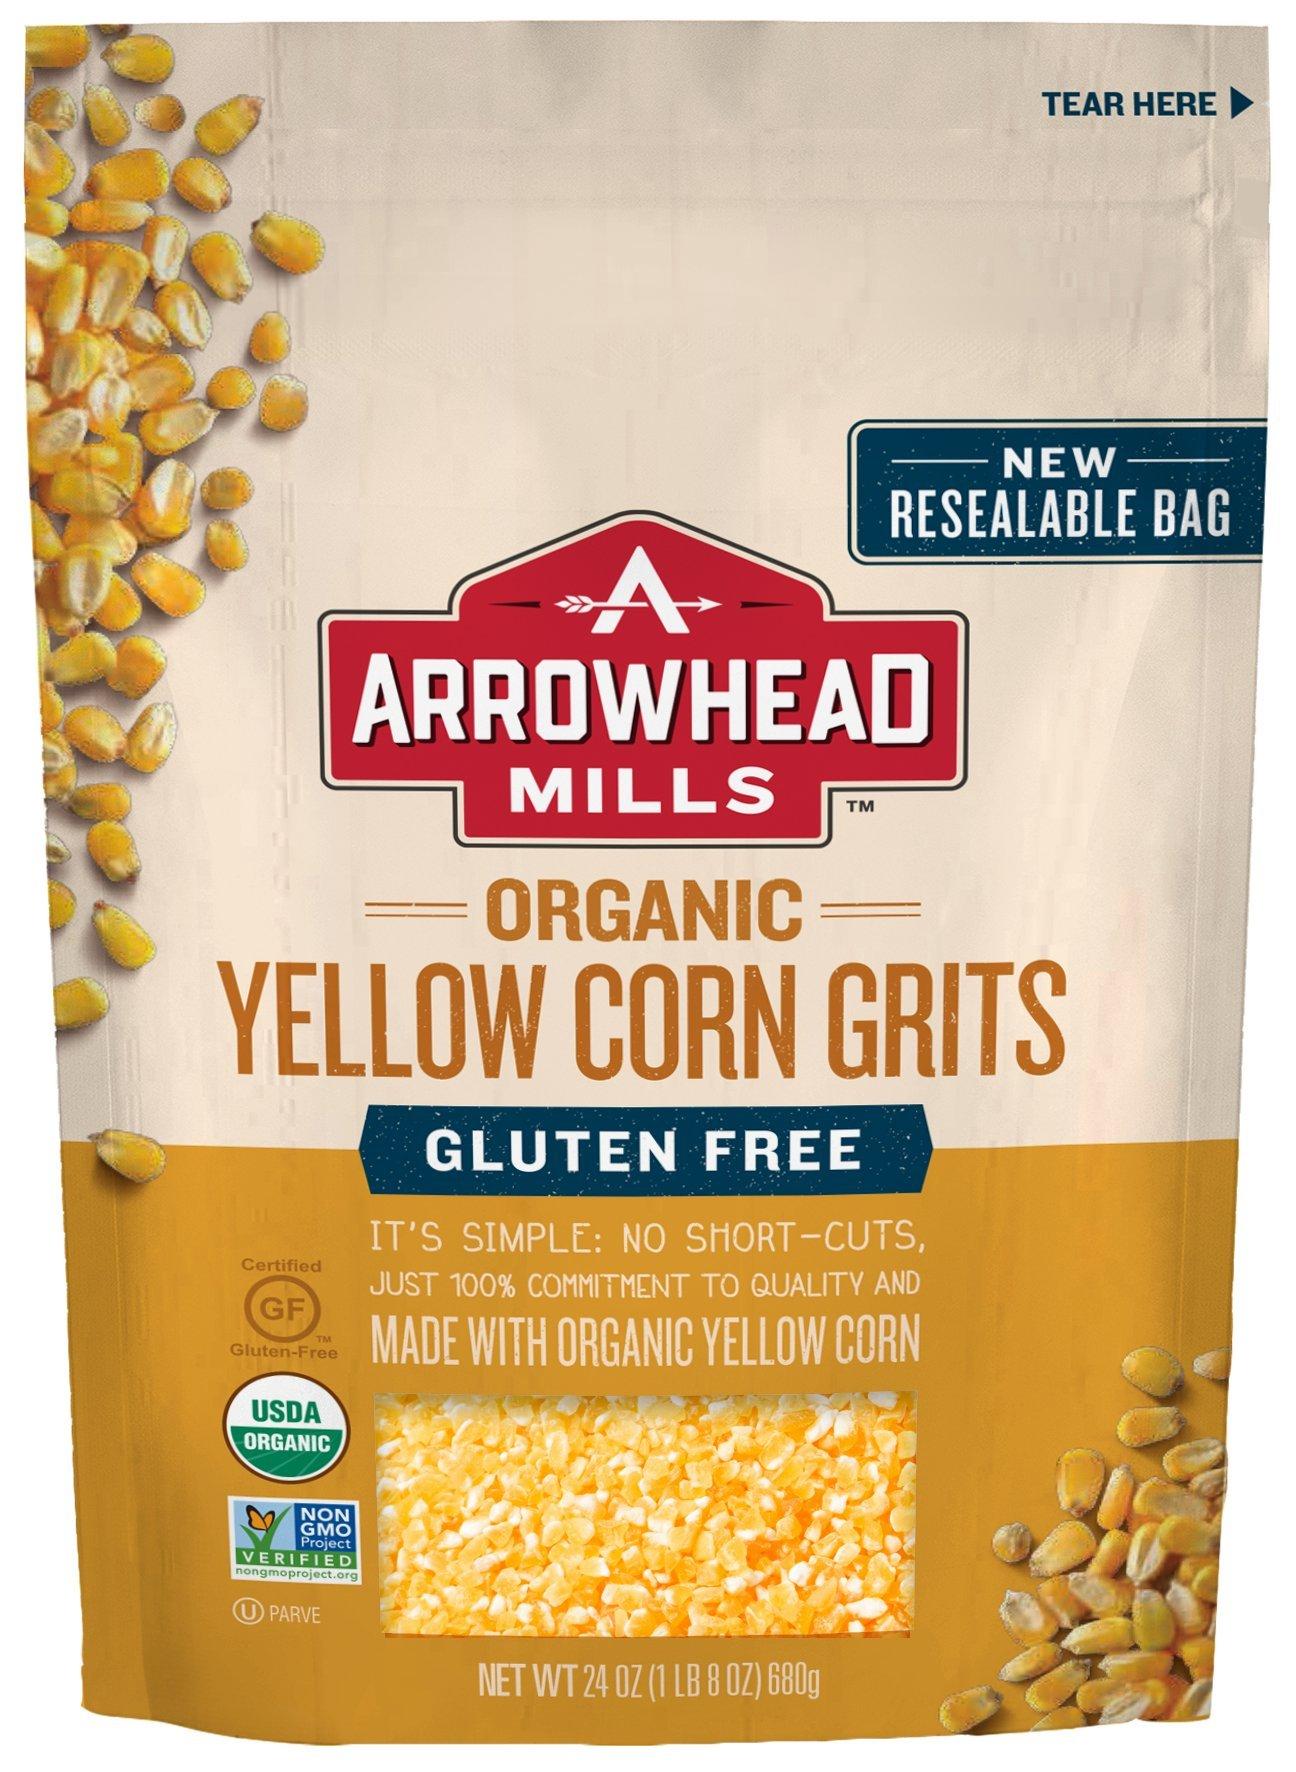 Arrowhead Mills Organic Gluten-Free Yellow Corn Grits, 24 oz. Bag (Pack of 6) by Arrowhead Mills (Image #1)